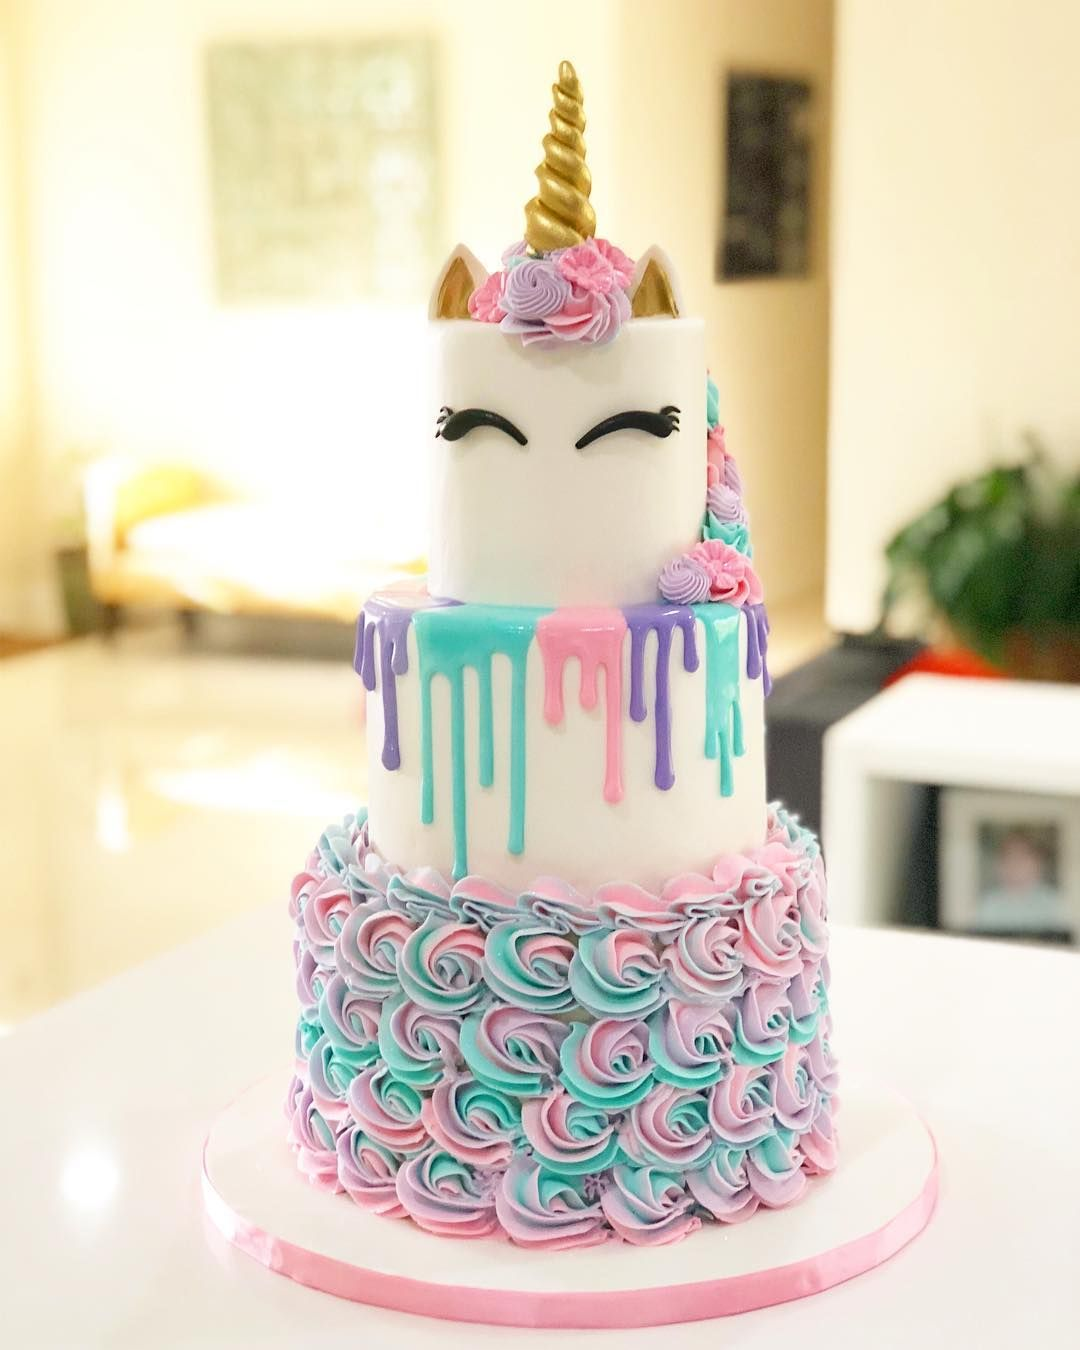 +15 Best Unicorn Cake & Party Decor Ideas Party cakes